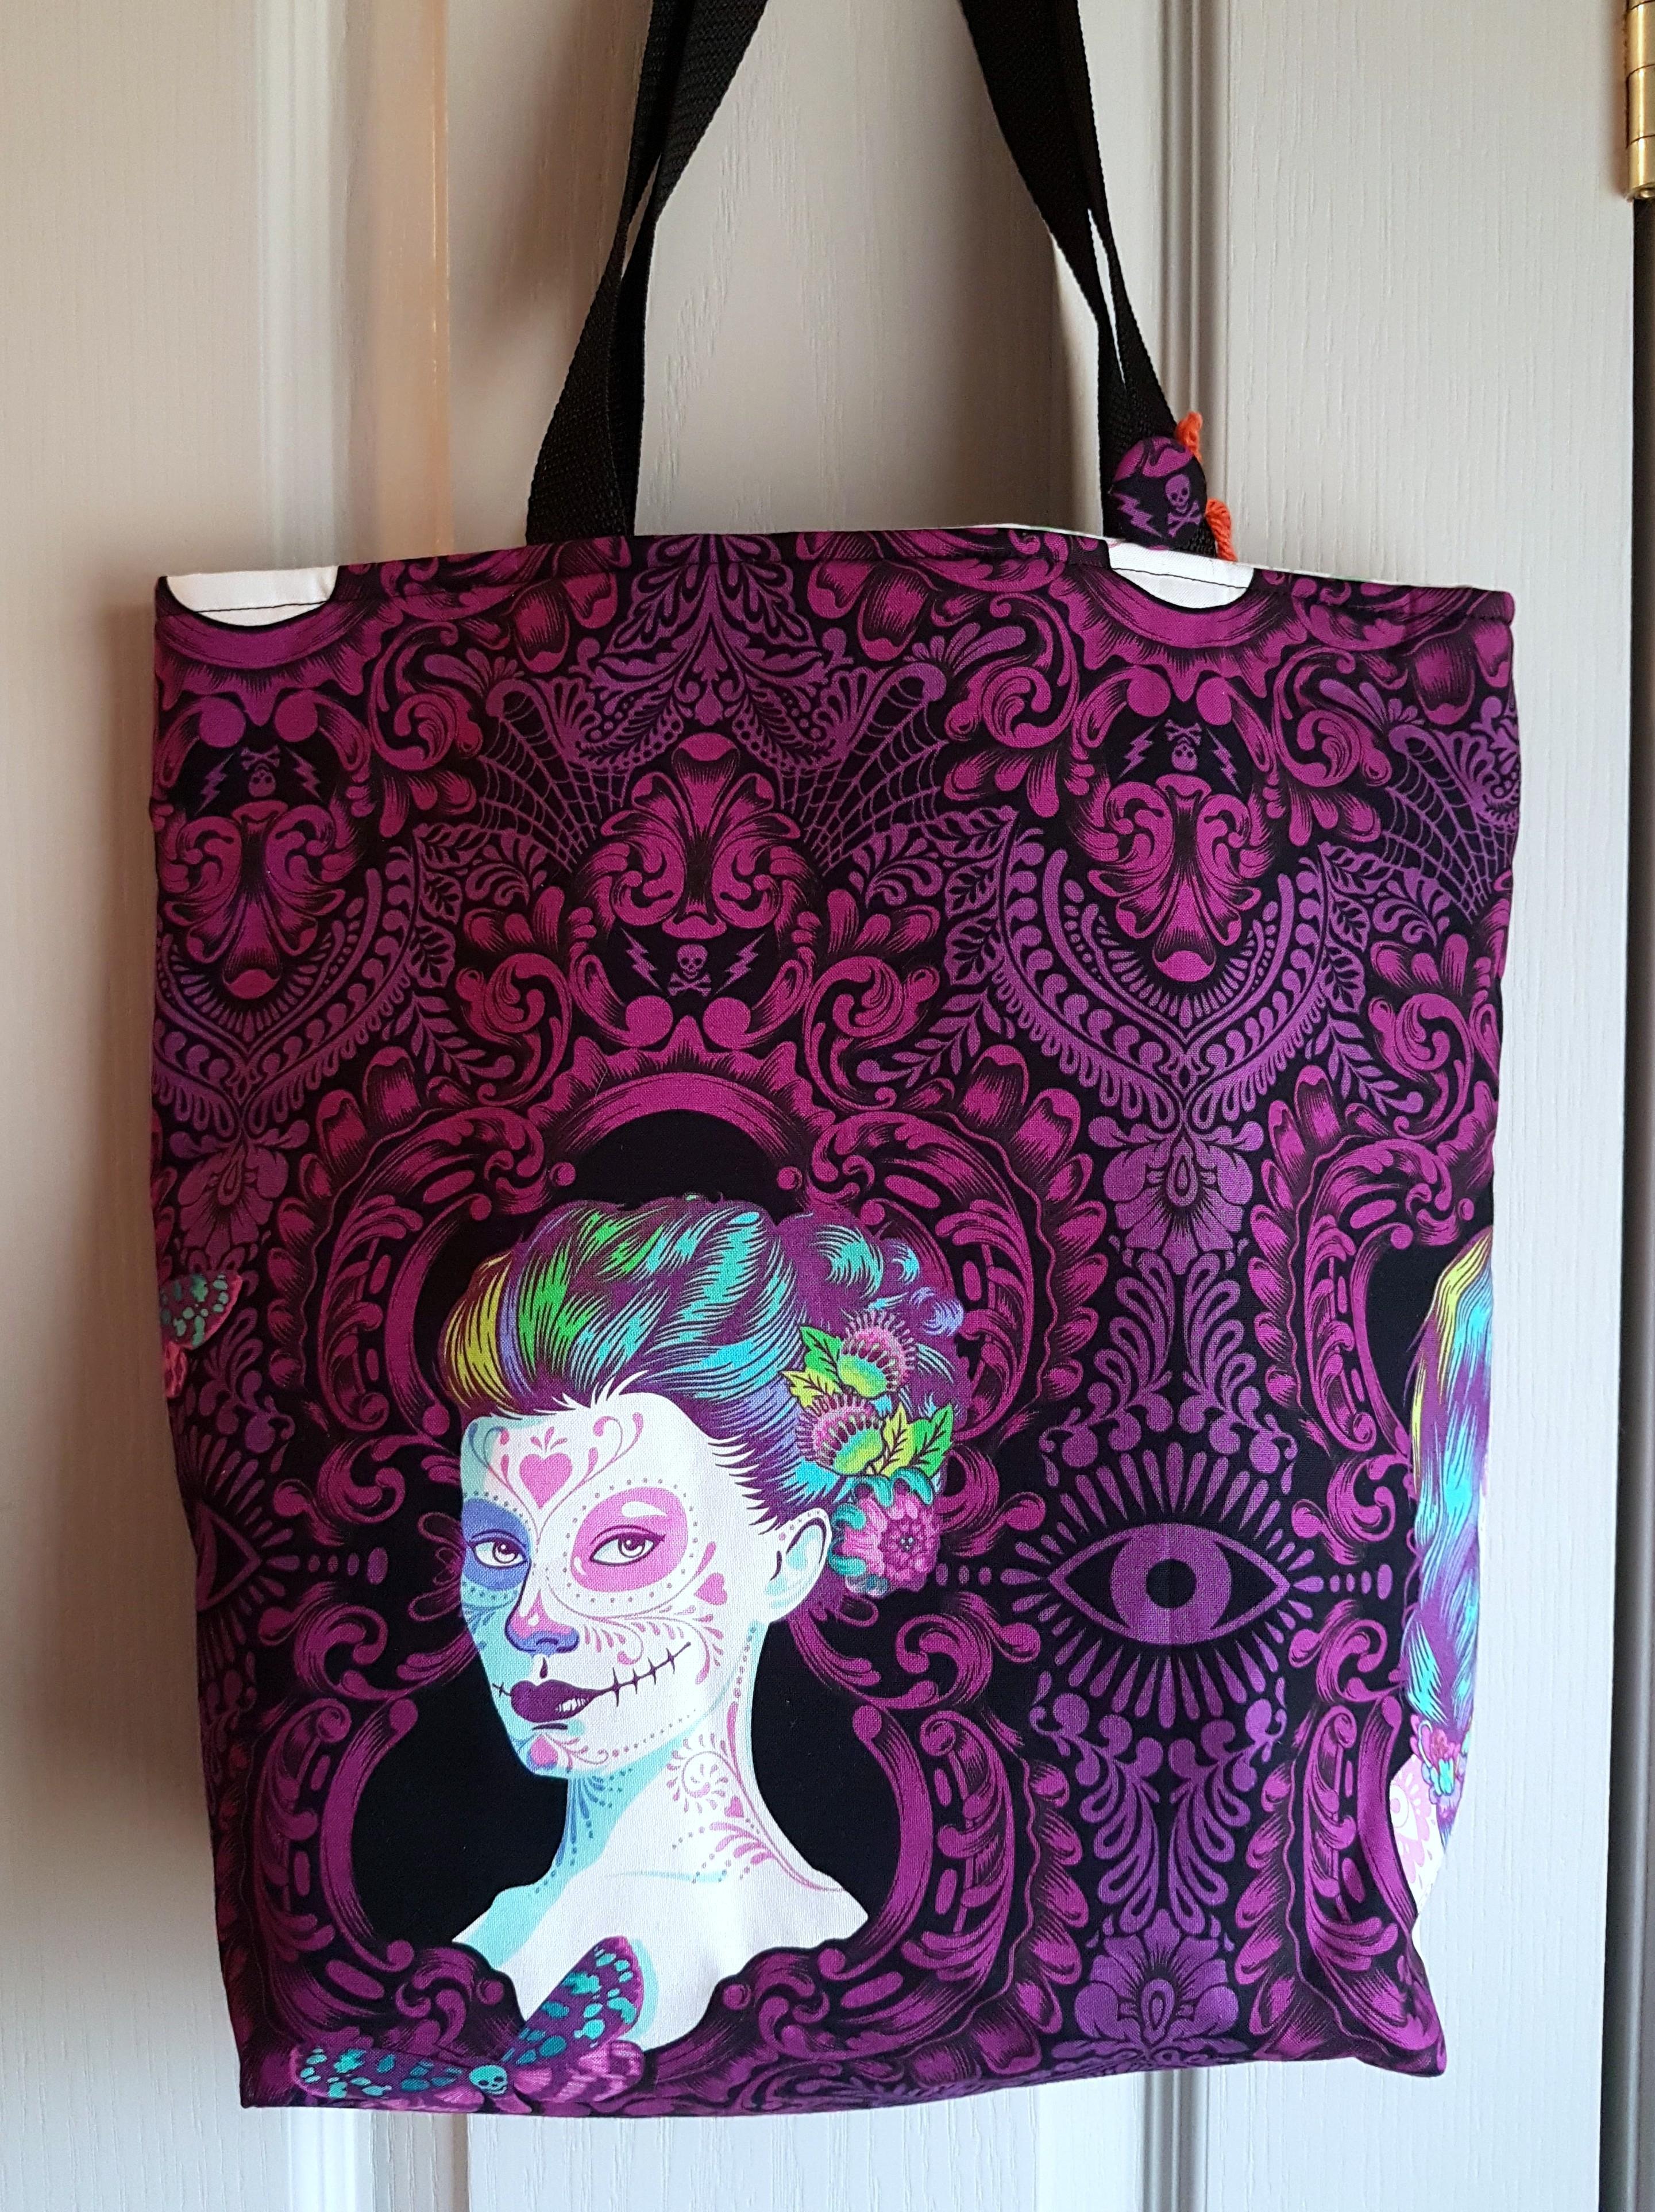 8154a4c1513 Zombie Ladies Handmade Tote Purse Bag - by MaCobbsHatShoppe on Zibbet